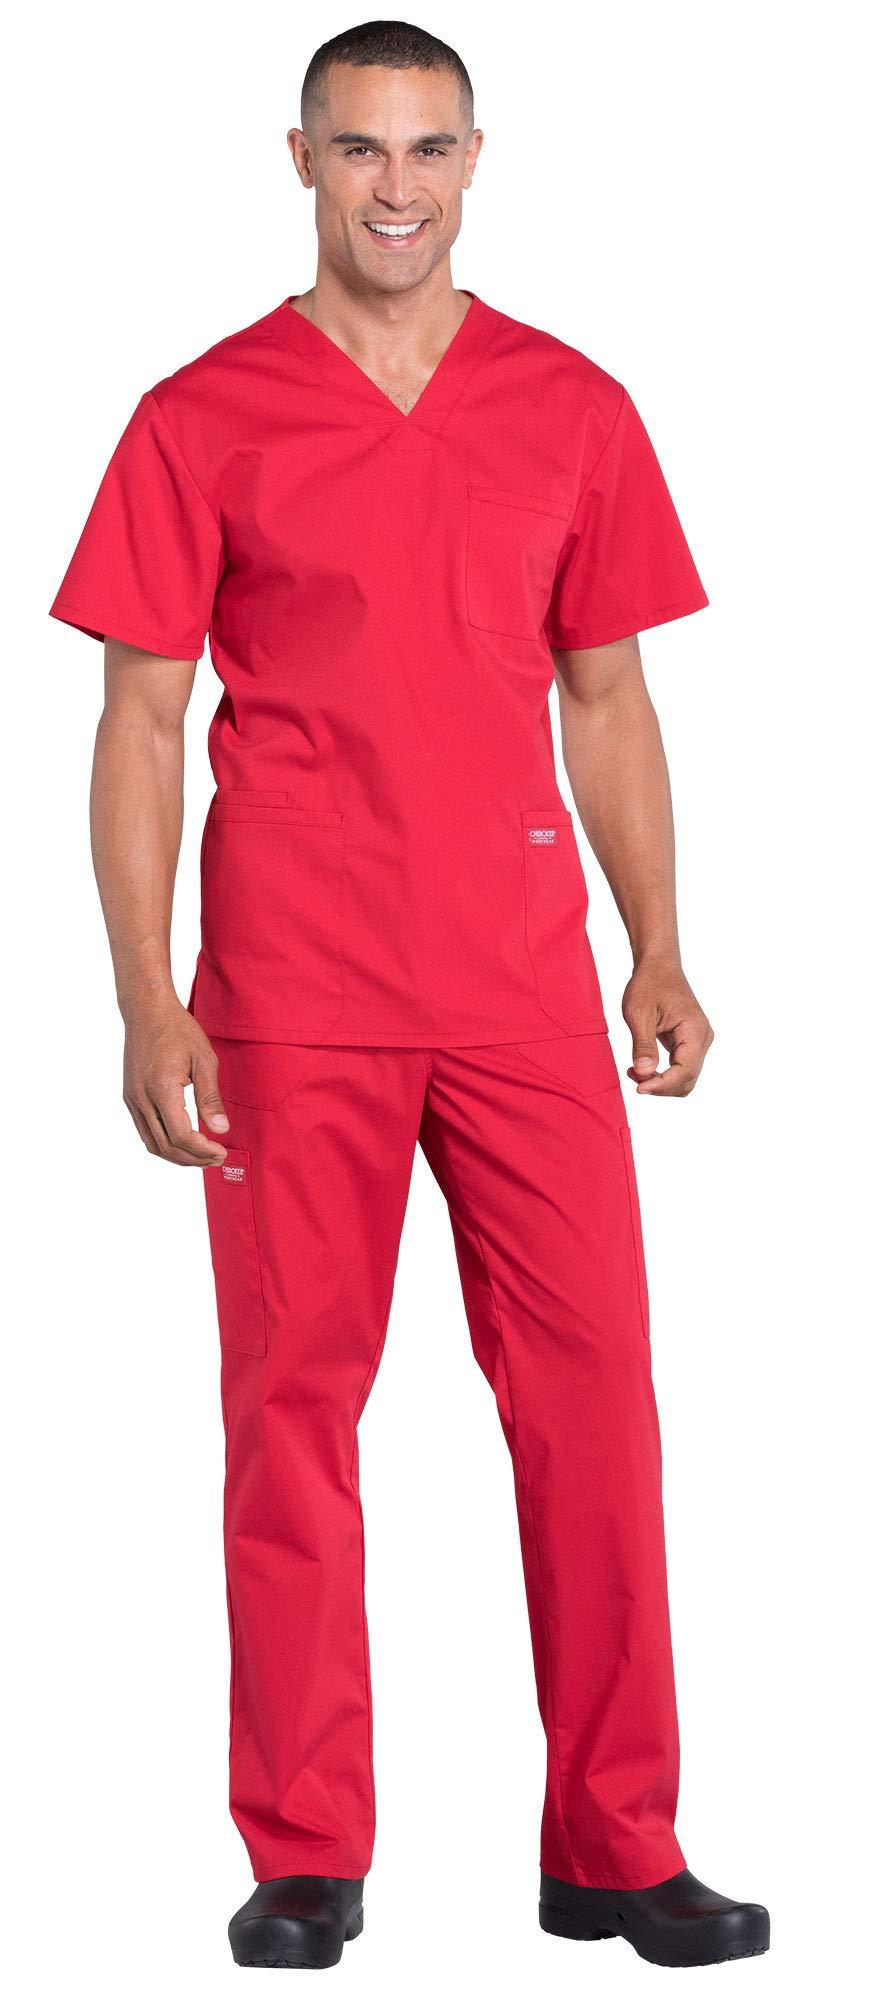 Cherokee Workwear Professionals Men's 4 Pocket V-Neck Scrub Top WW695 & Men's Drawstring Cargo Scrub Pants WW190 Medical Uniforms Scrub Set (Red - XX-Large/XX-Large)